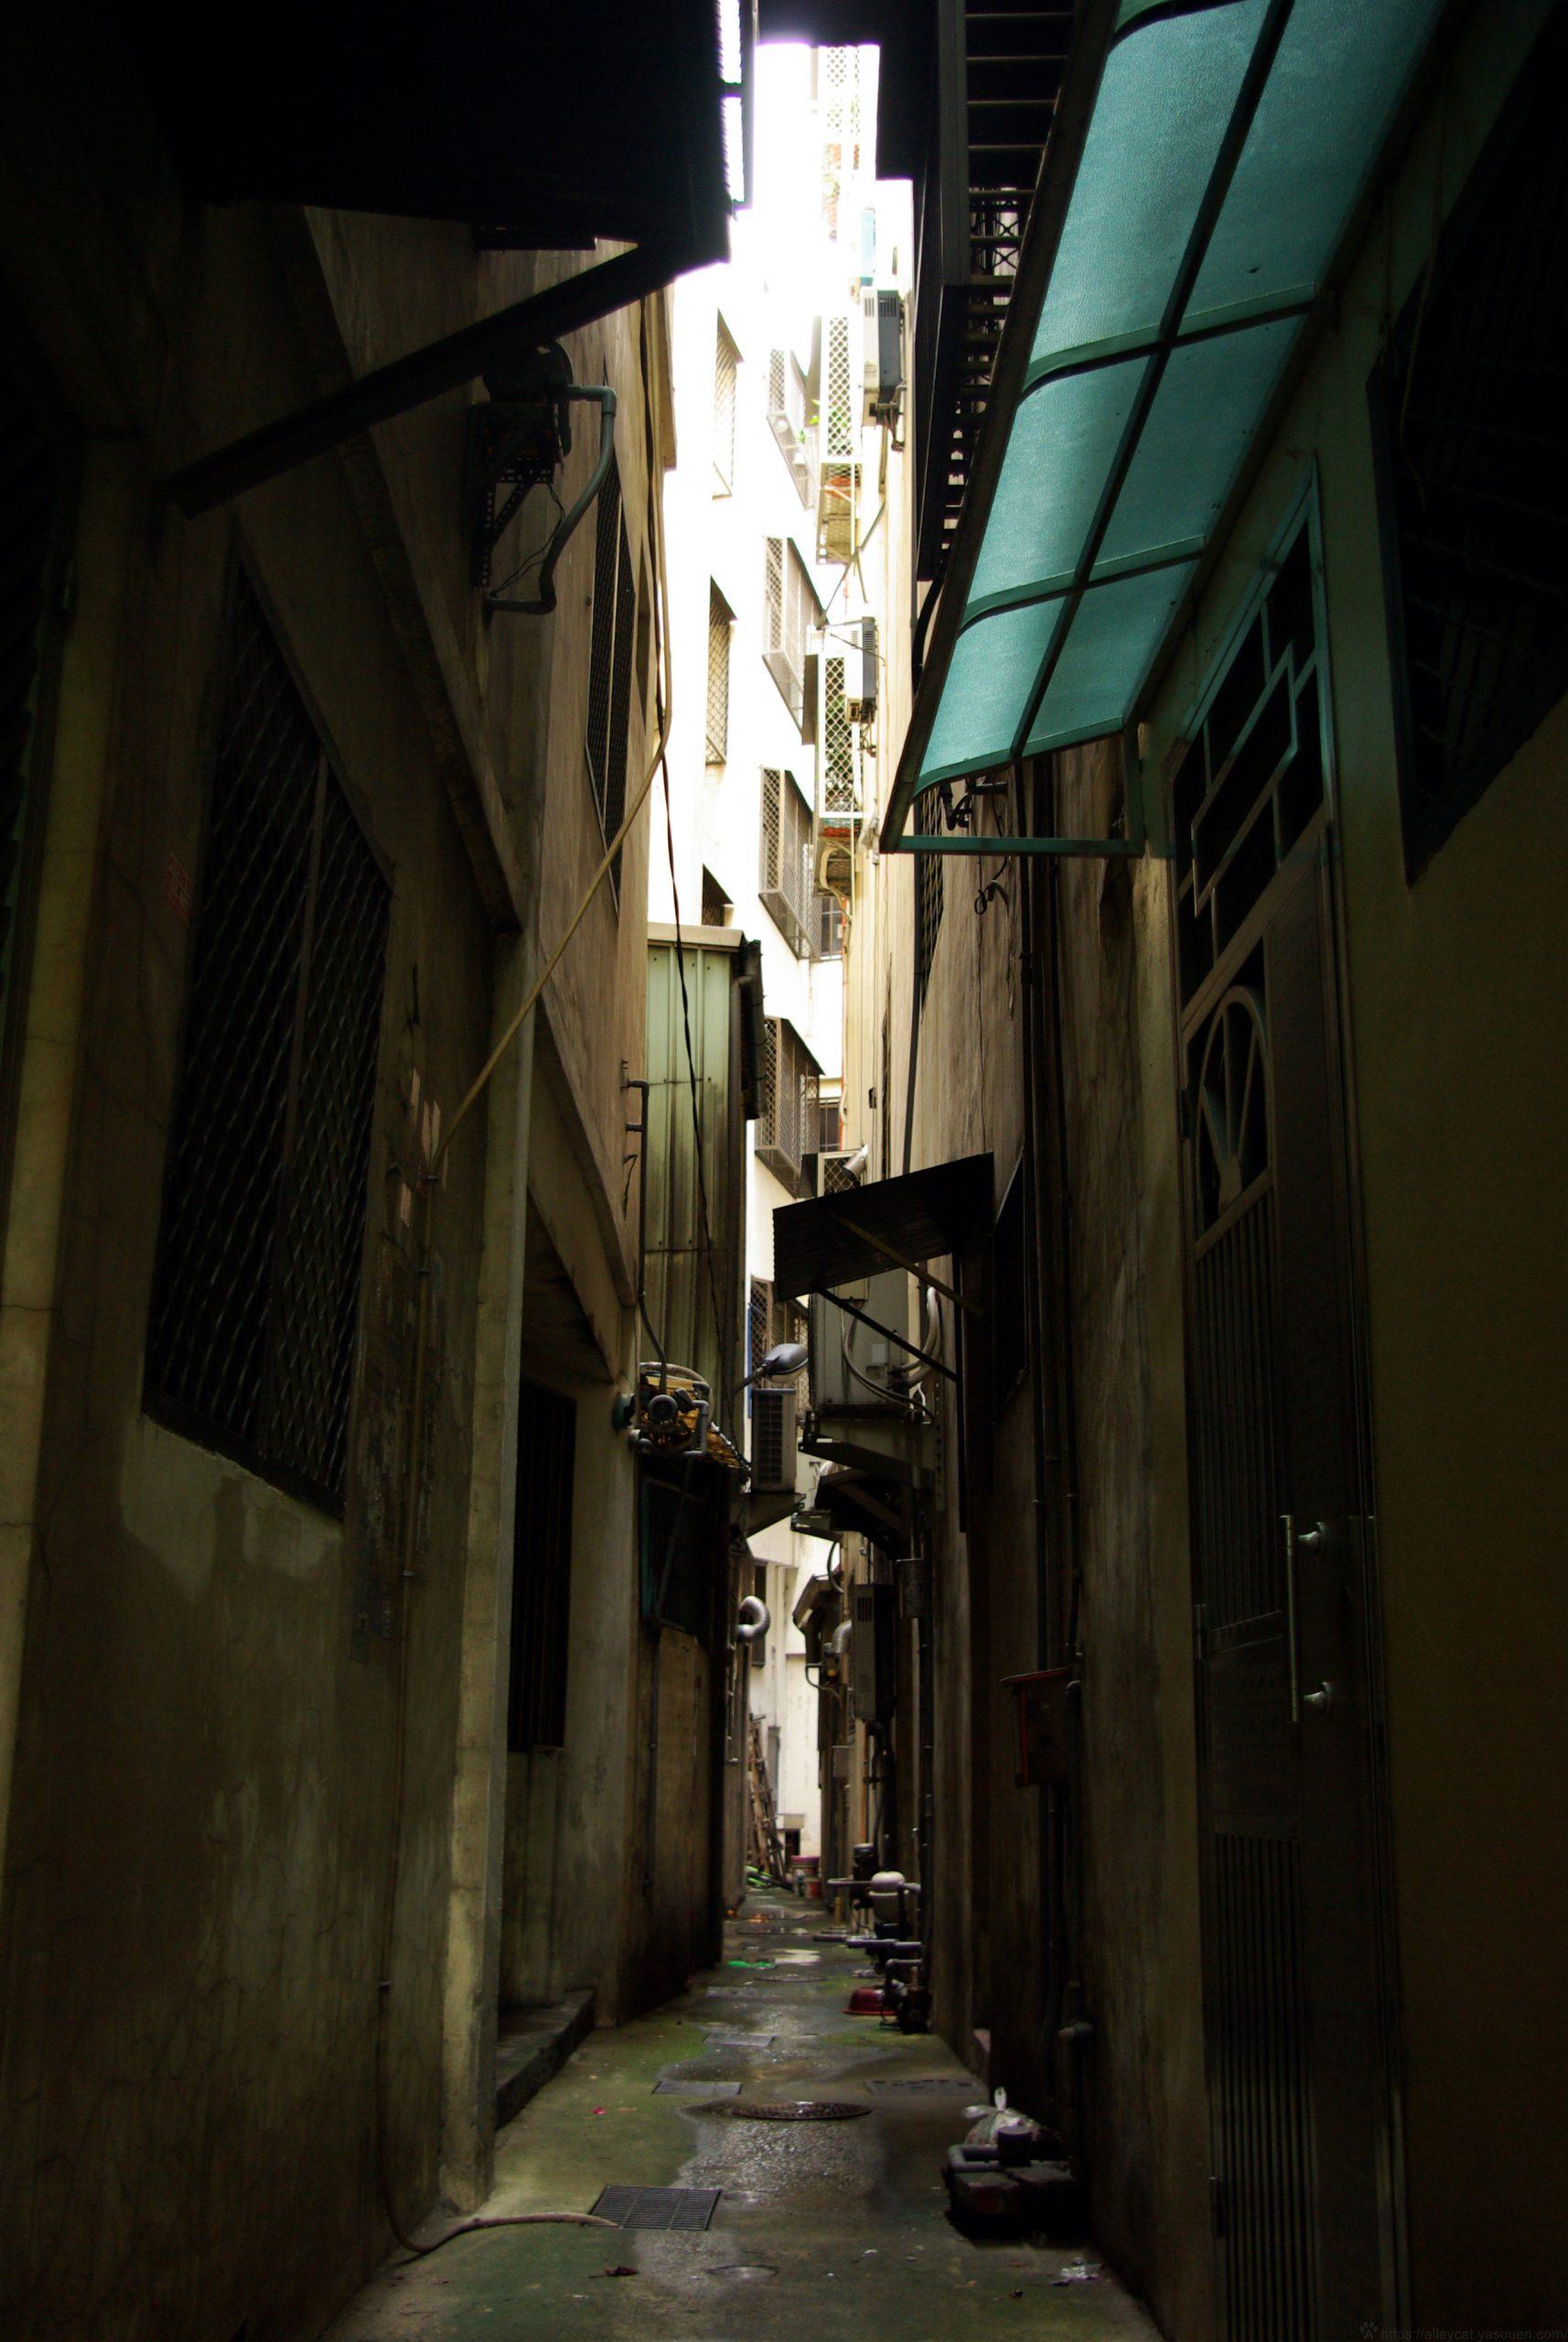 Taichung, Taiwan, 2007